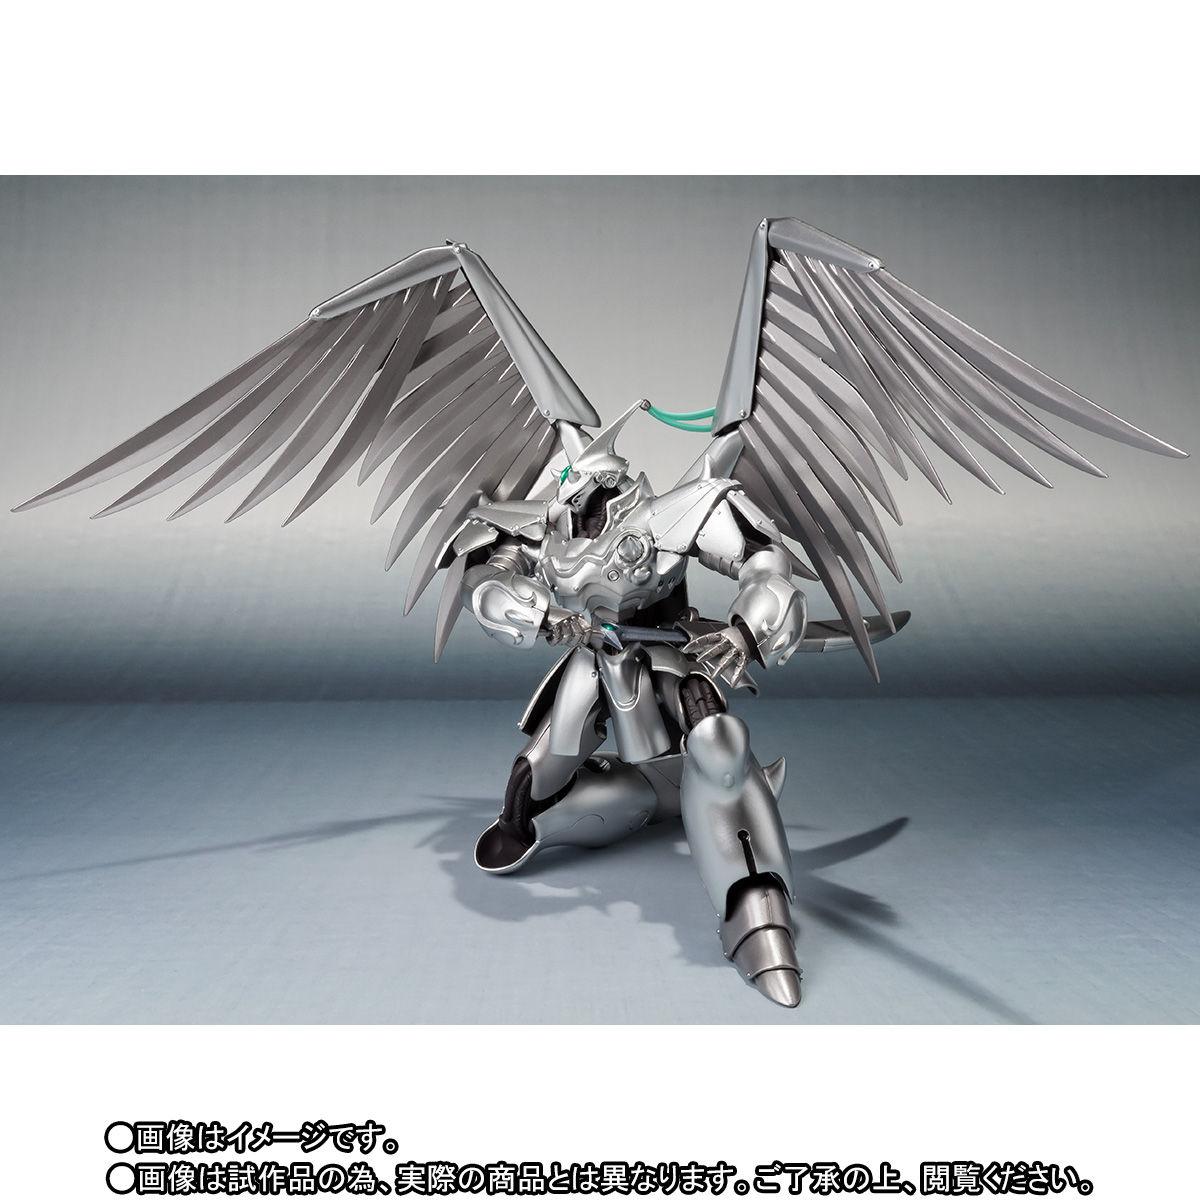 ROBOT魂〈SIDE PB〉『飛甲兵』機甲界ガリアン 鉄の紋章 可動フィギュア-005